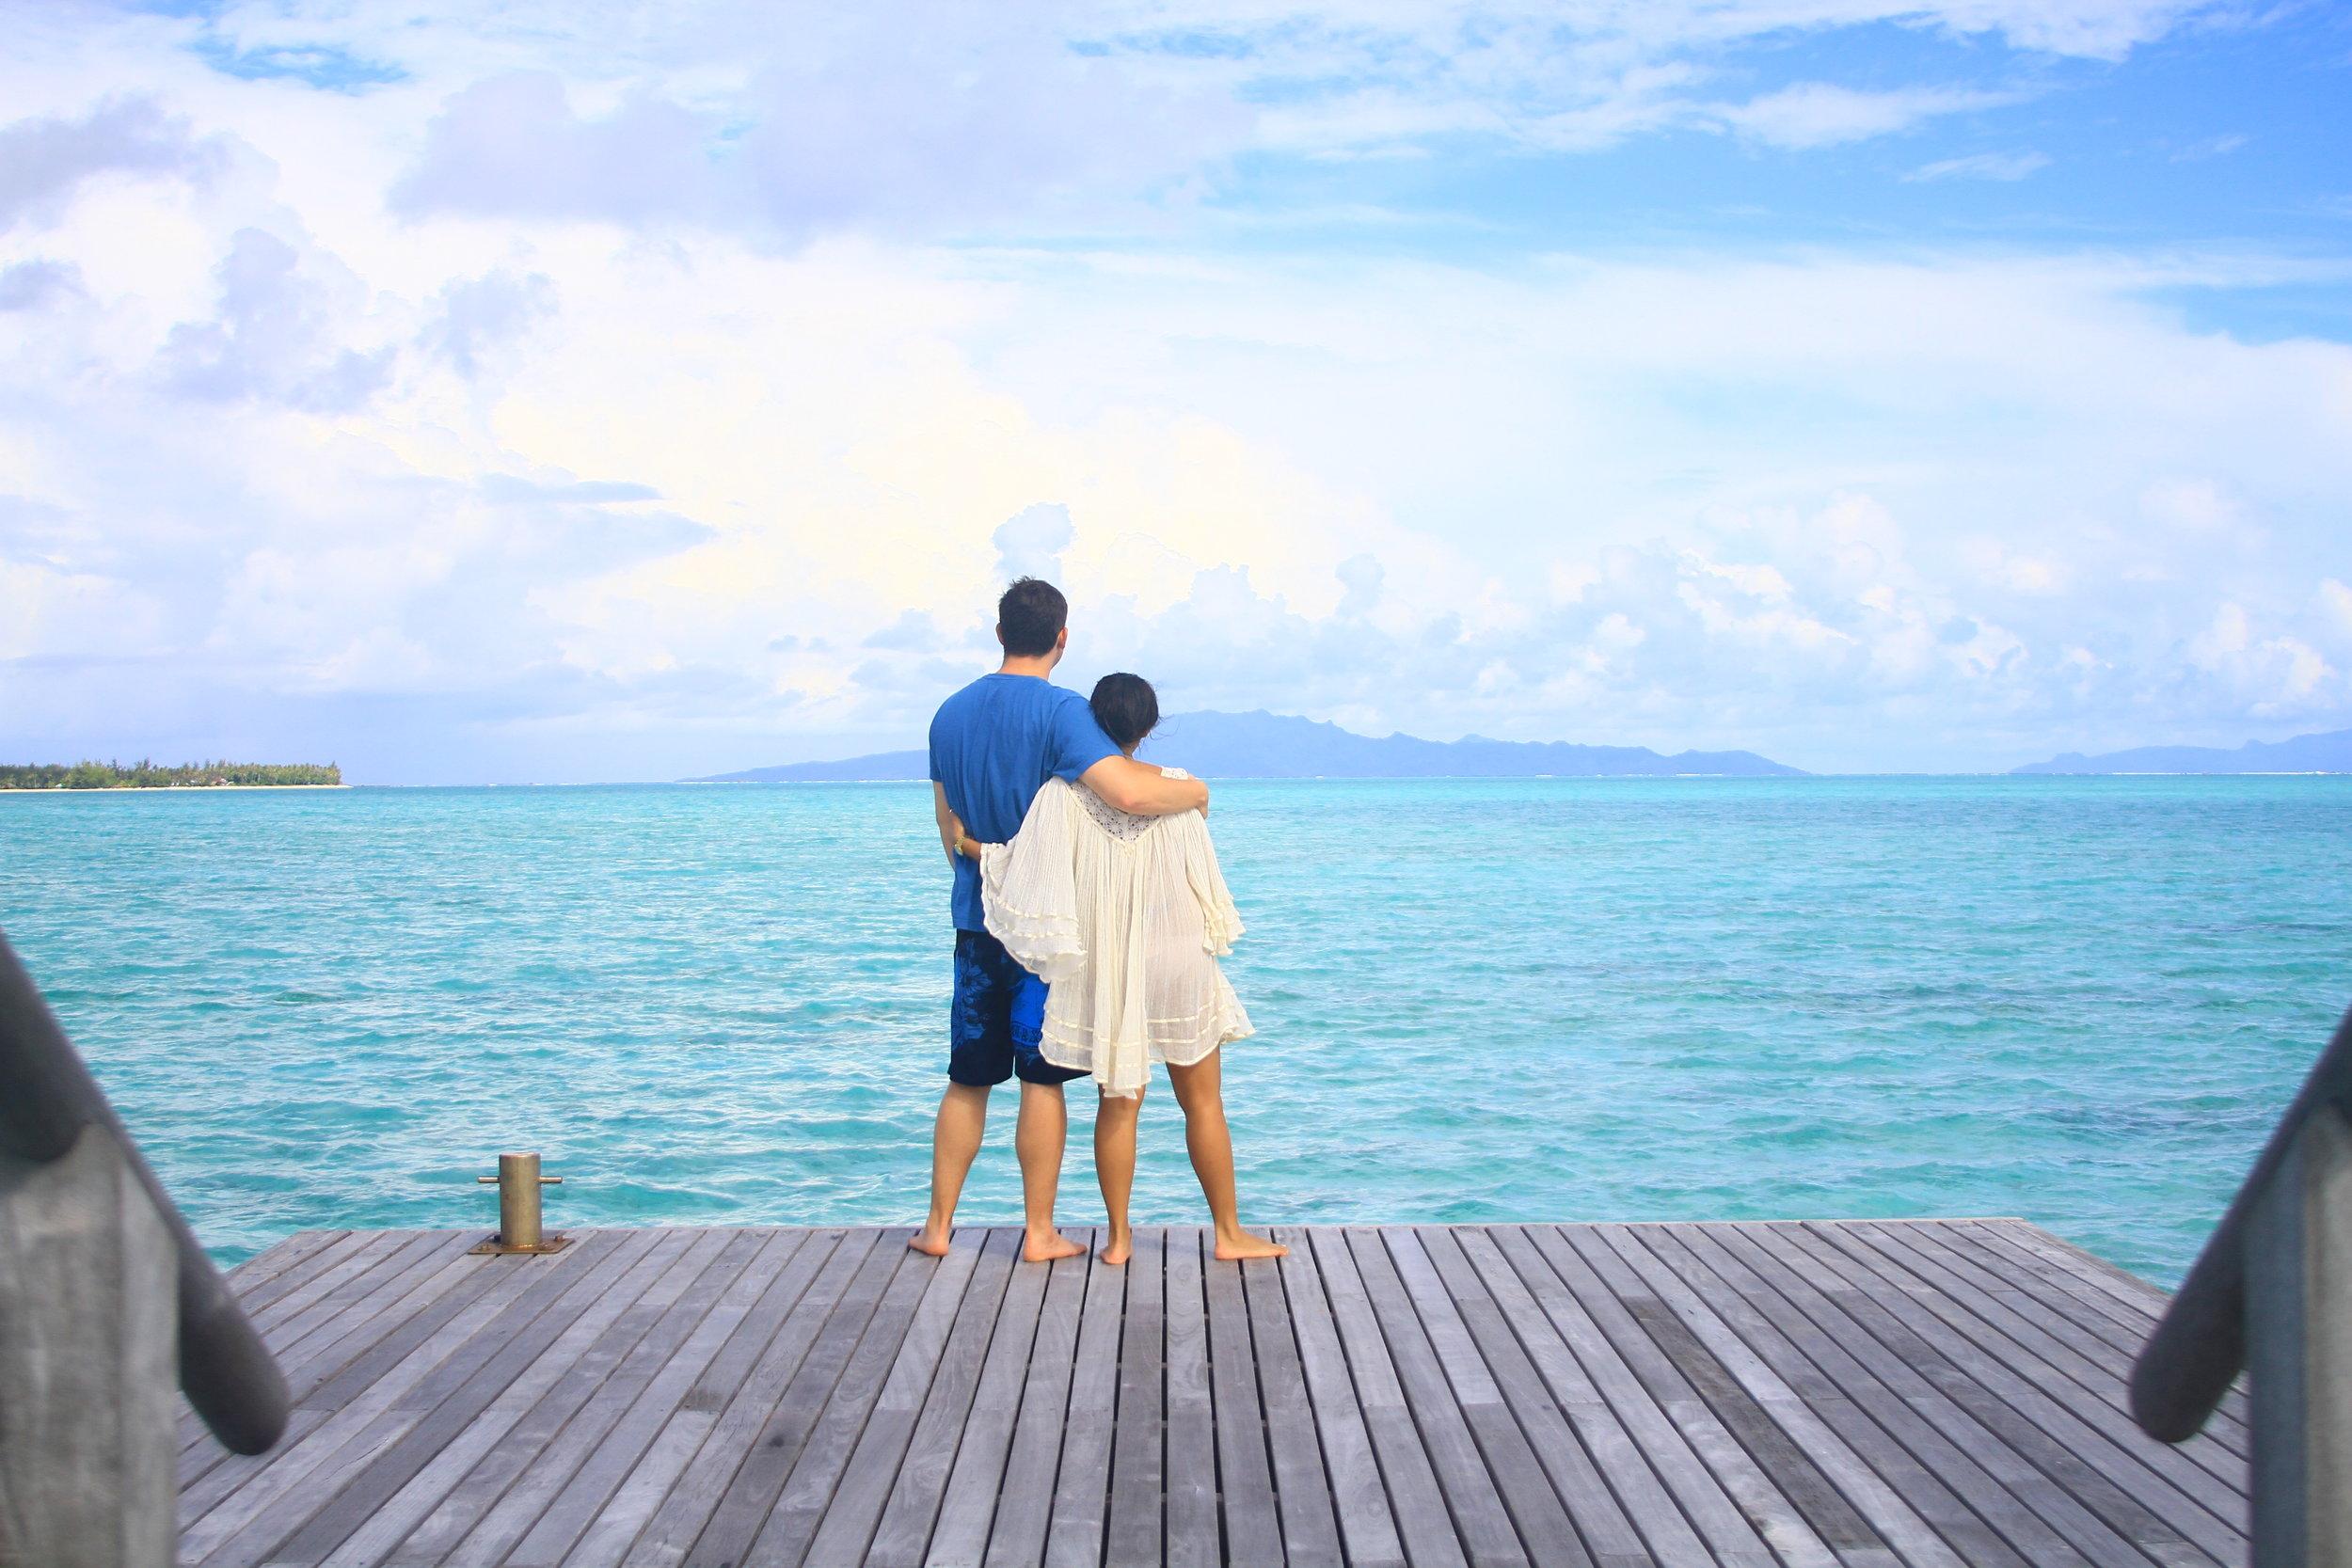 Wedding-Photographer-Honeymoon-Bora Bora.JPG